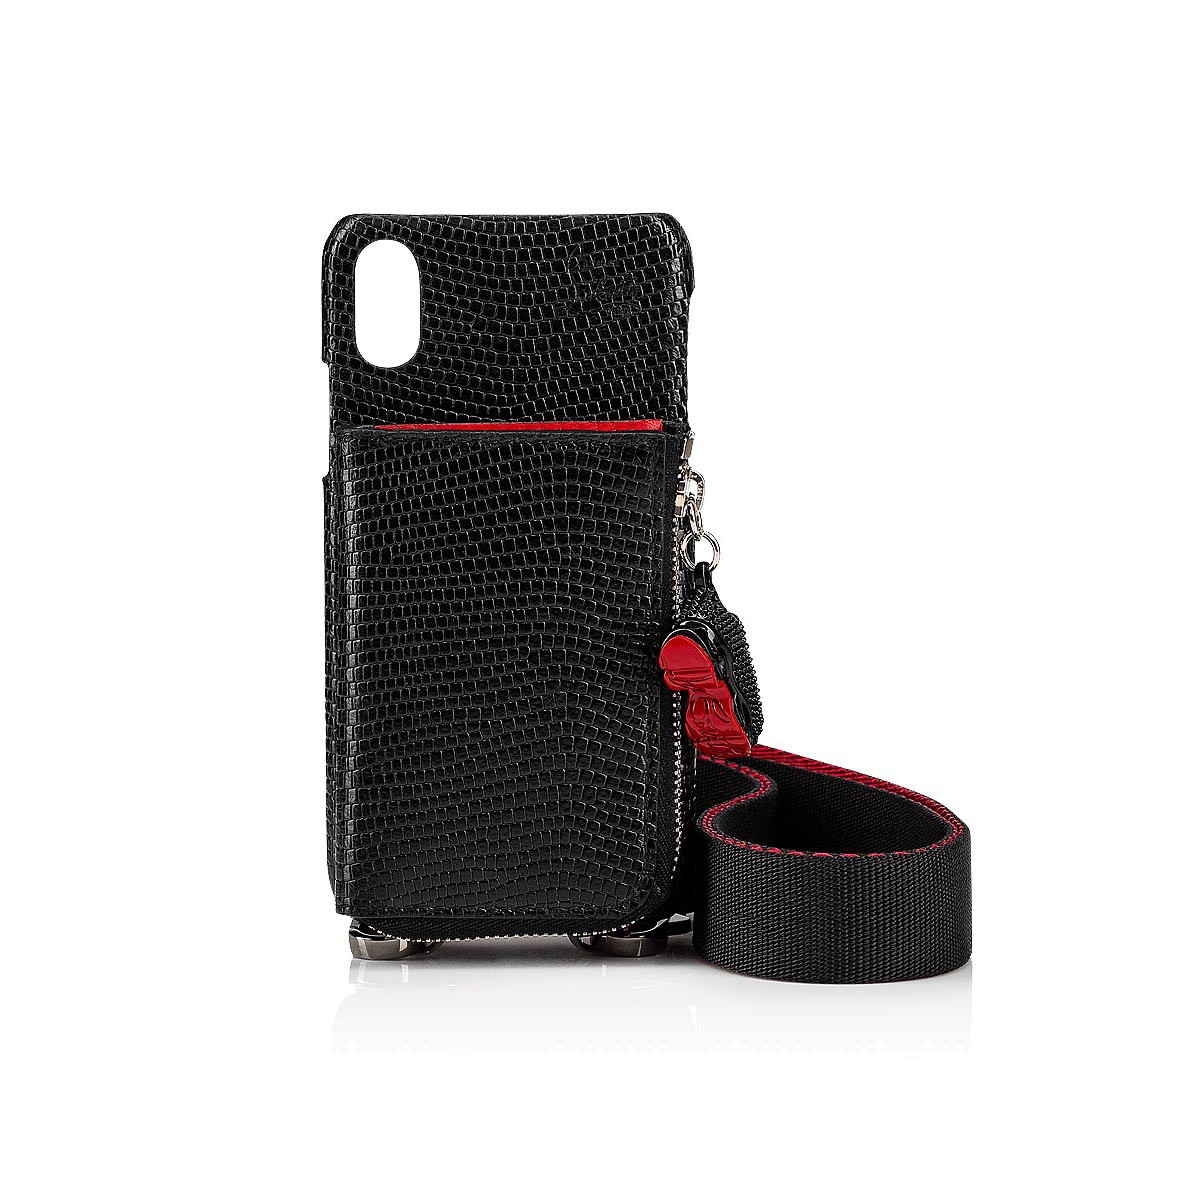 Small Leather Goods - Loubicharm Case Iphone X/xs - Christian Louboutin